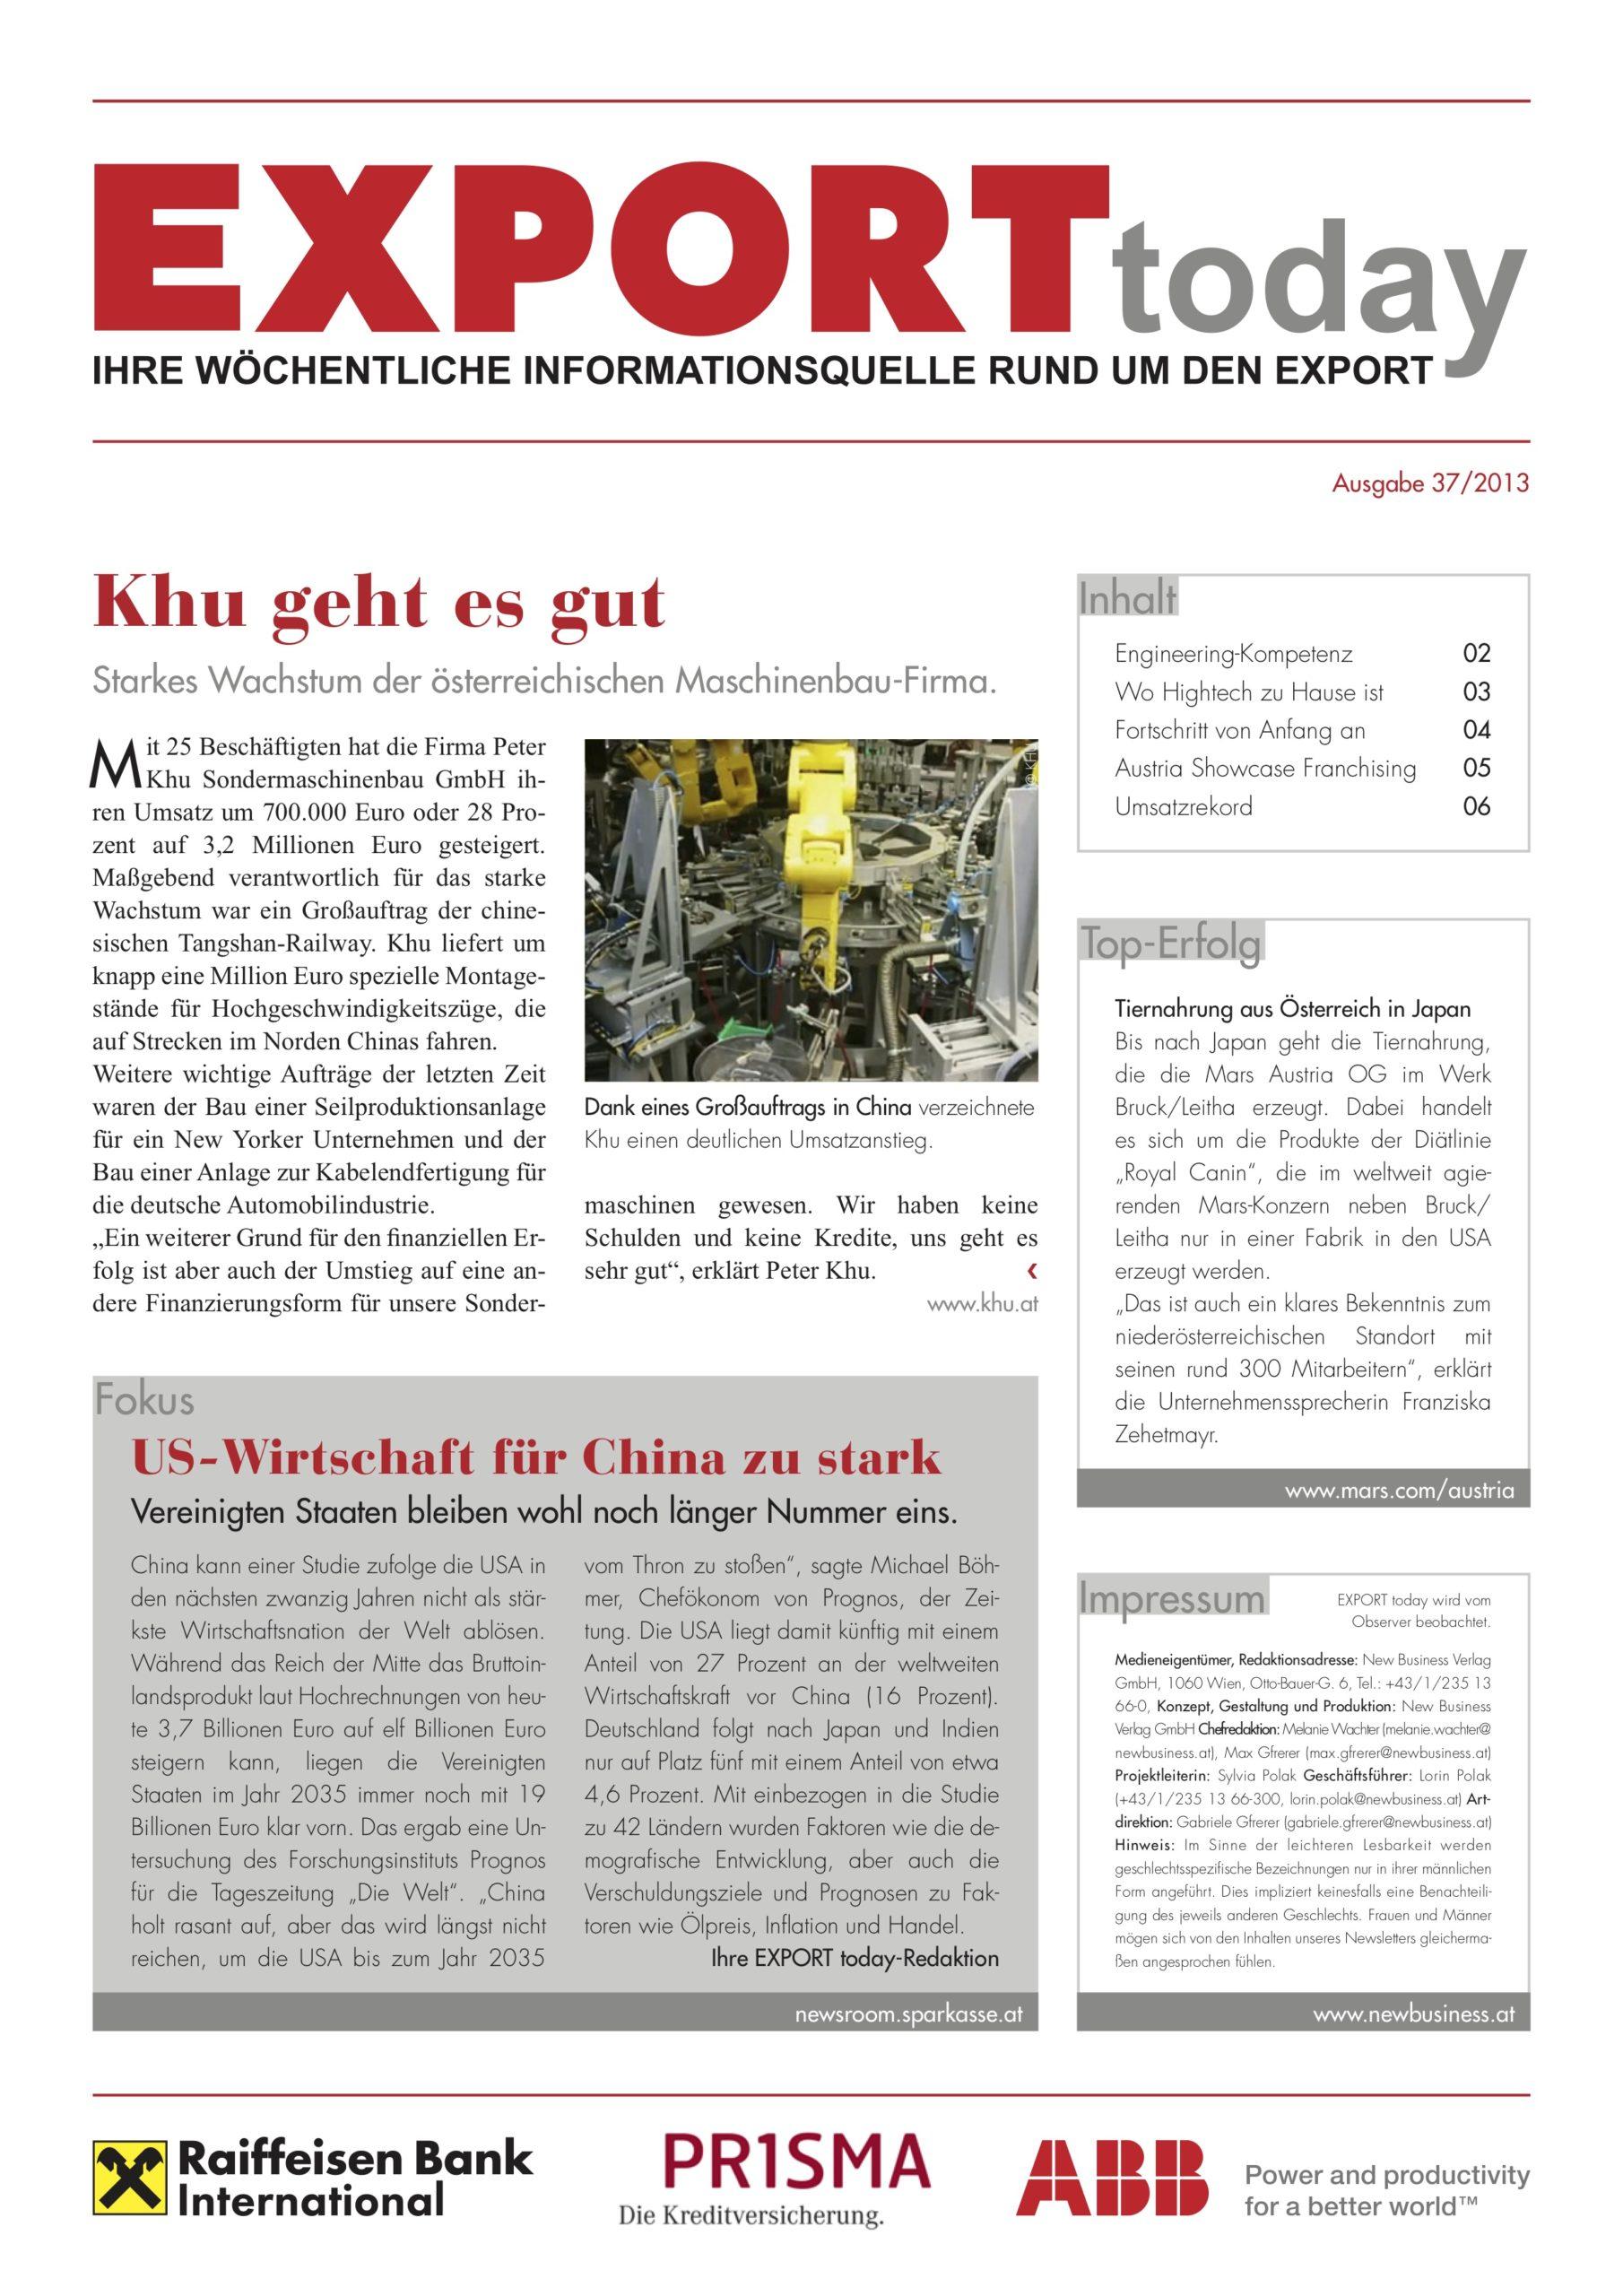 Export Today Pressemeldung über KHU China Exporte